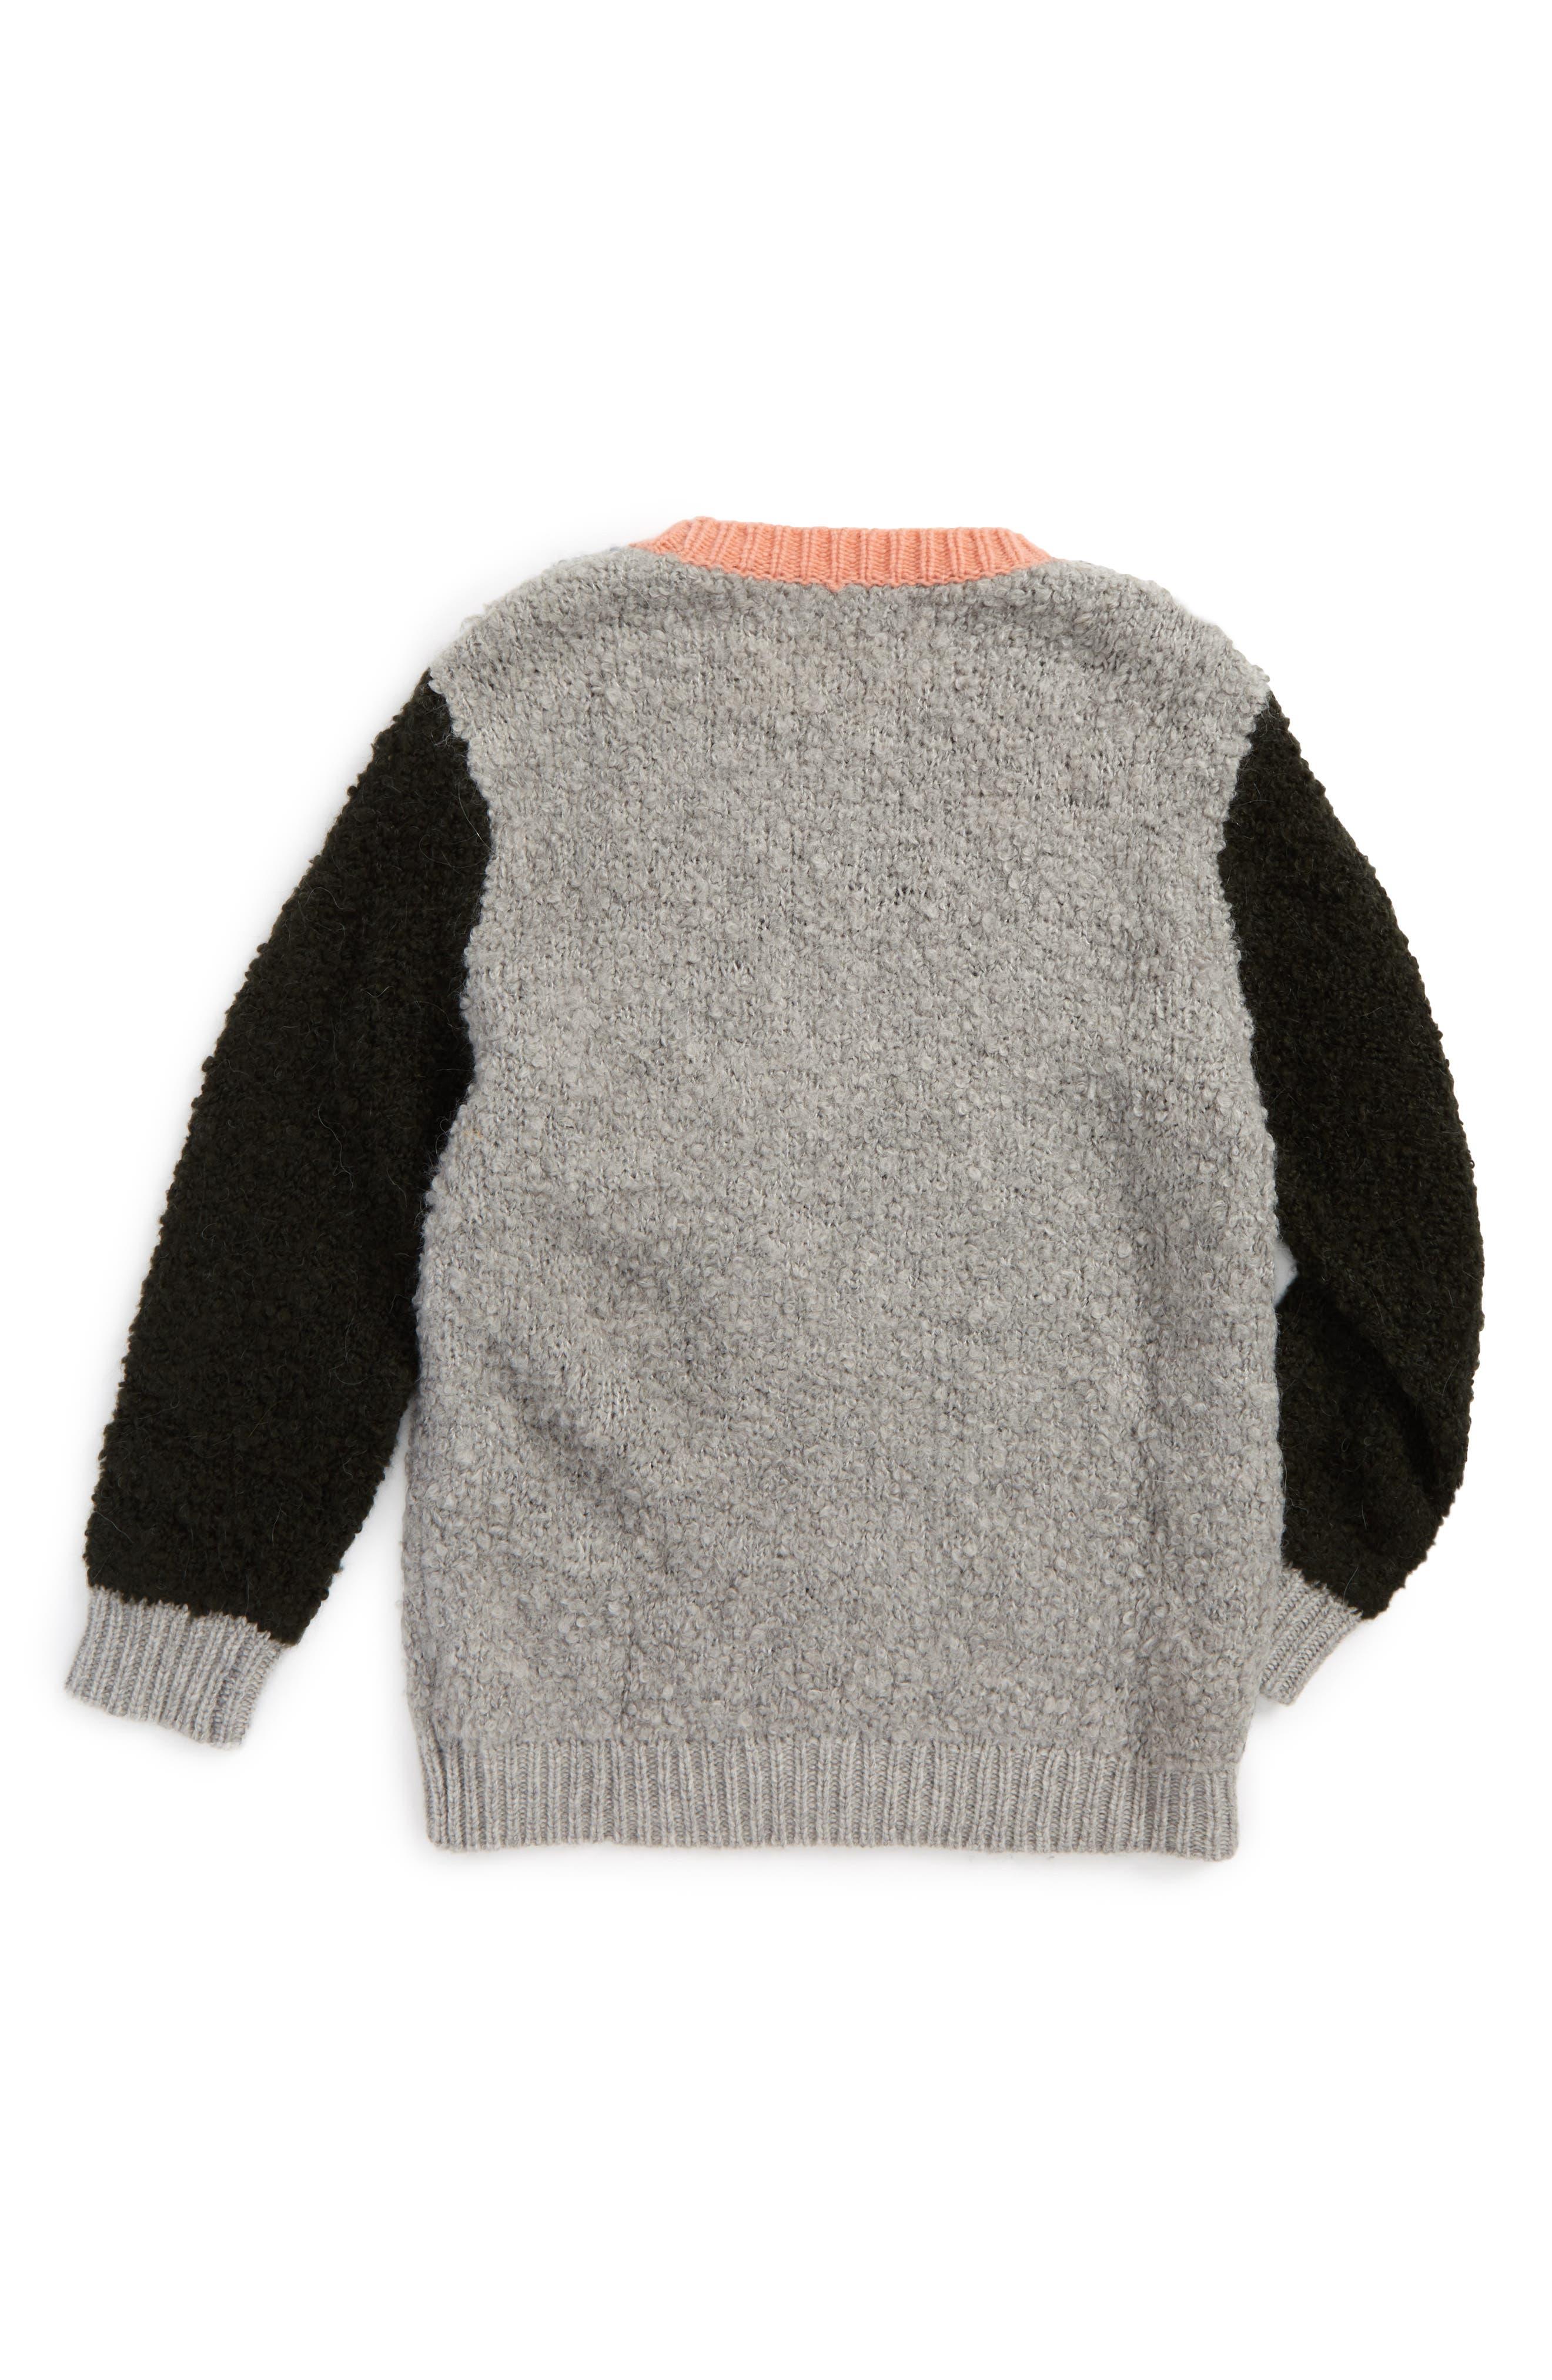 Kids Maya Colorblock Sweater,                             Alternate thumbnail 2, color,                             Petrol